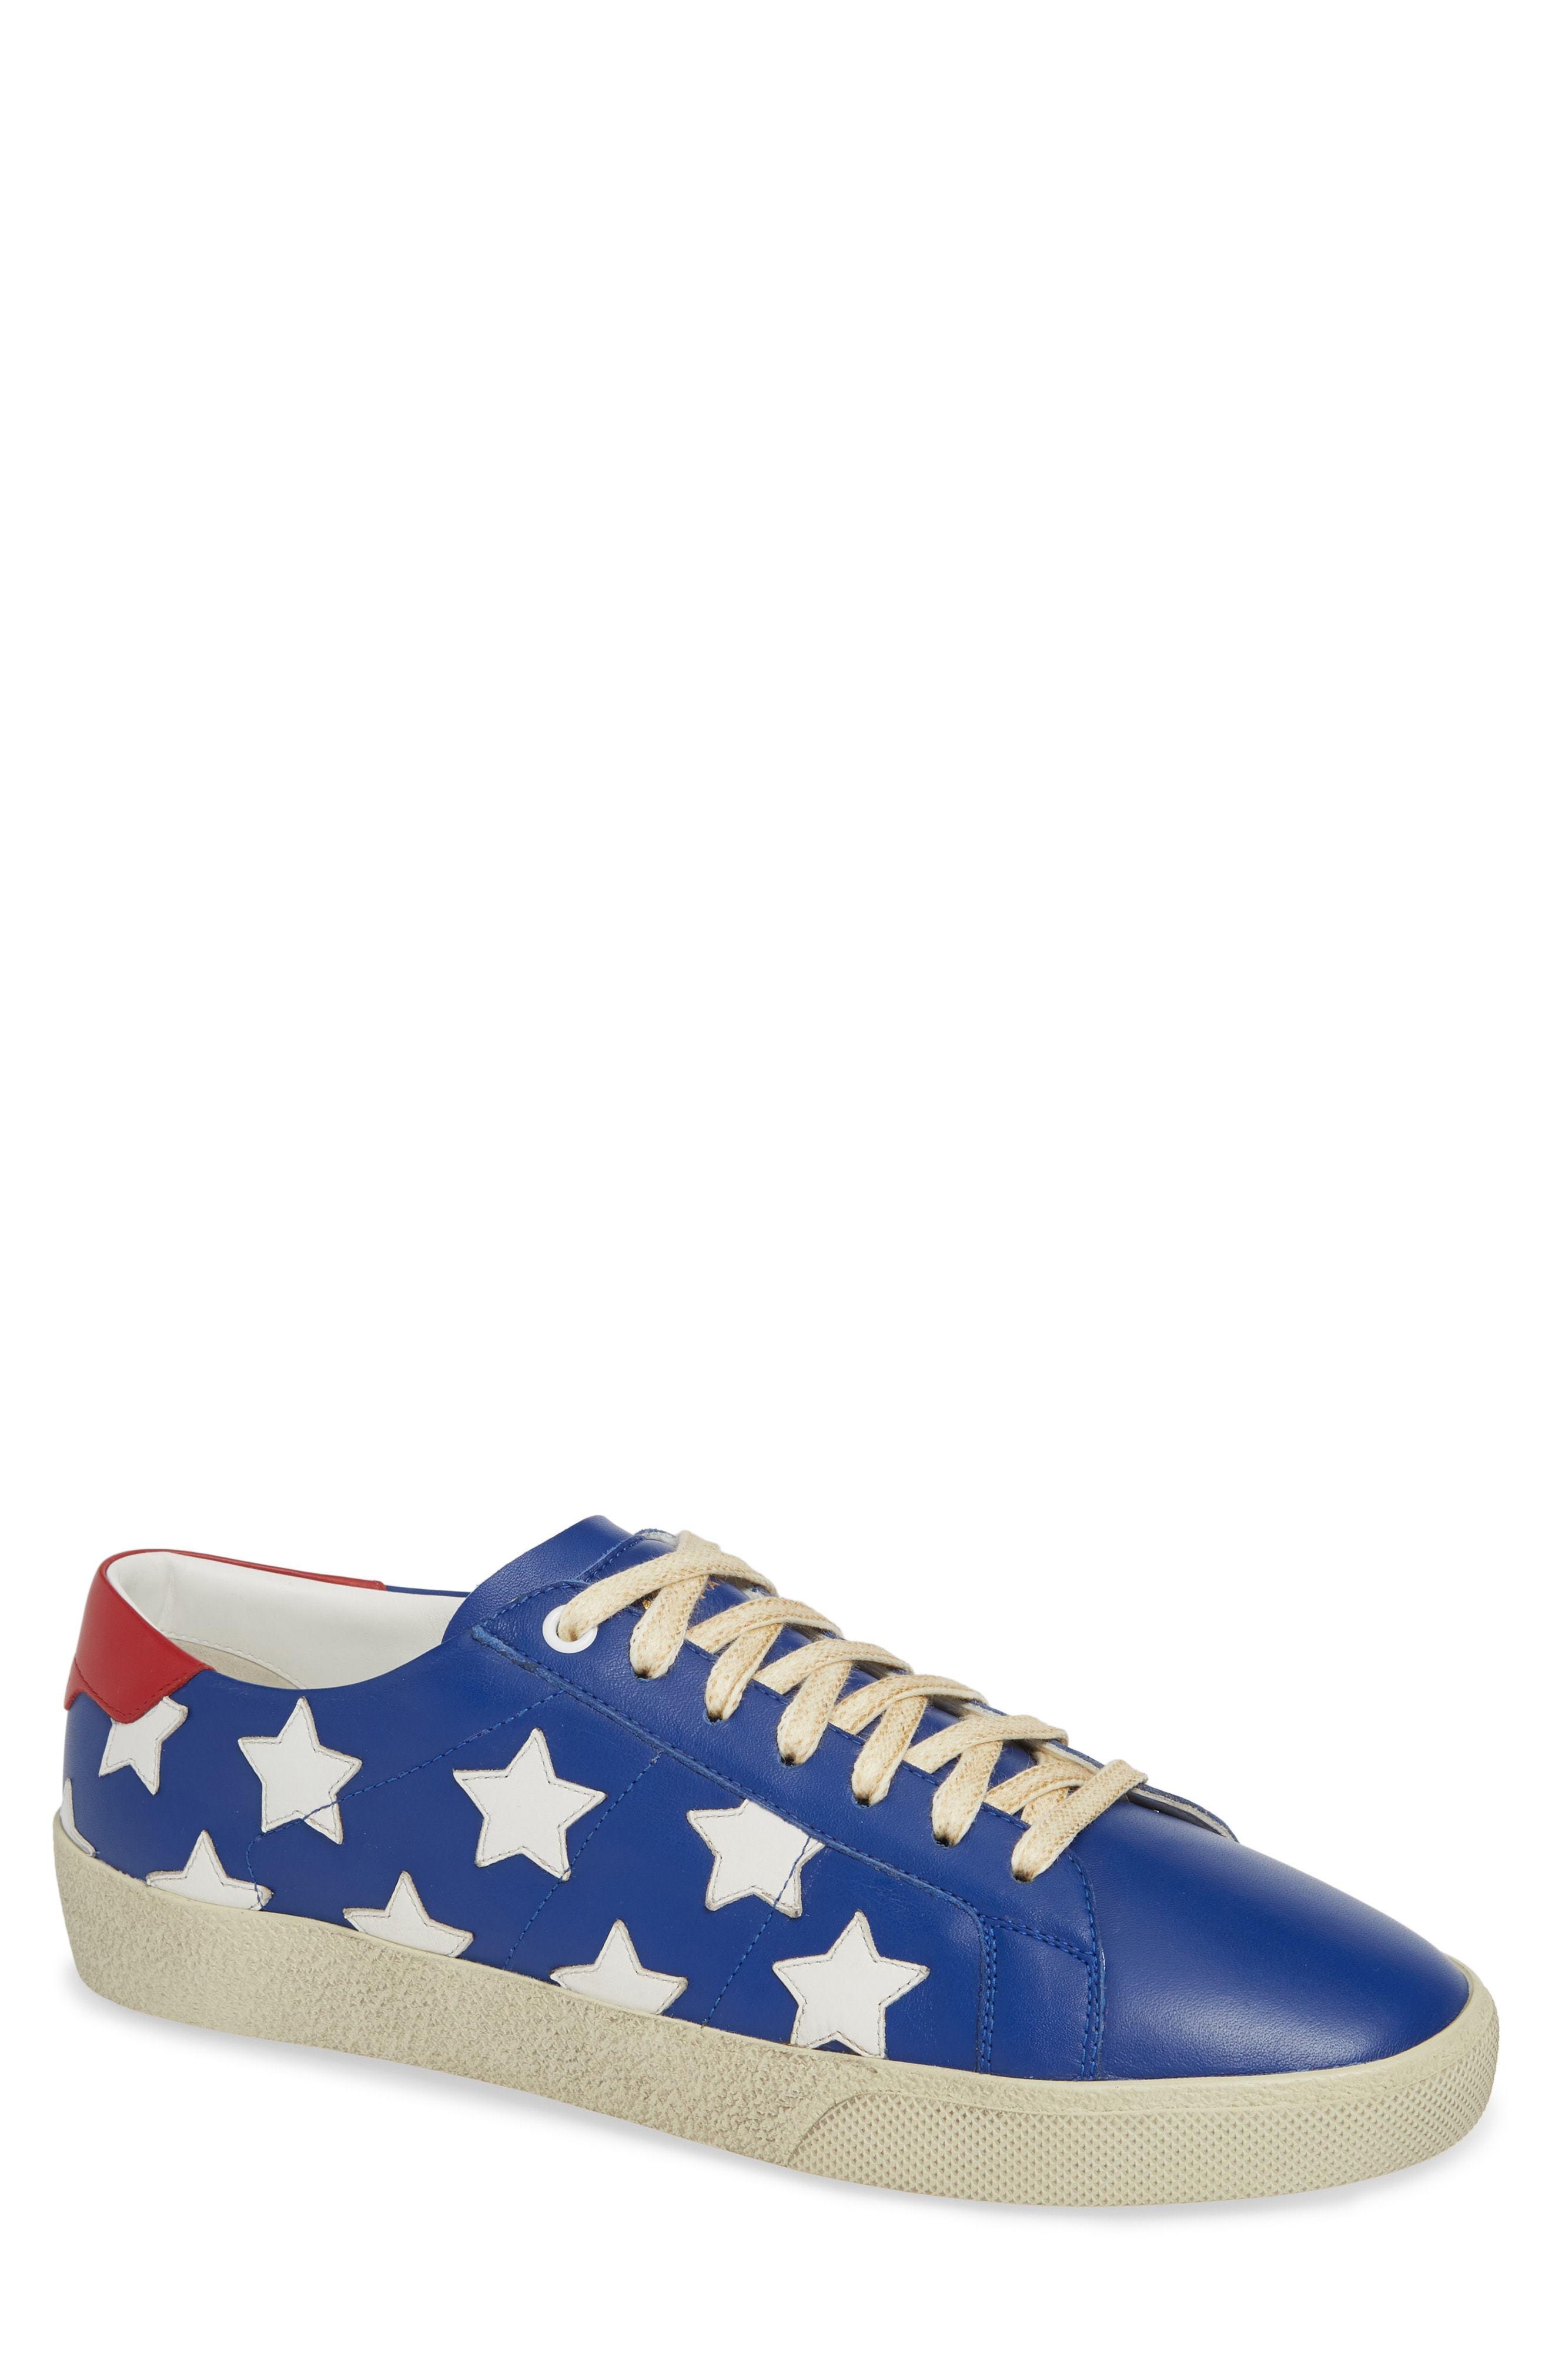 5187b6d34eb Saint Laurent Star Low Top Sneaker, $545 | Nordstrom | Lookastic.com